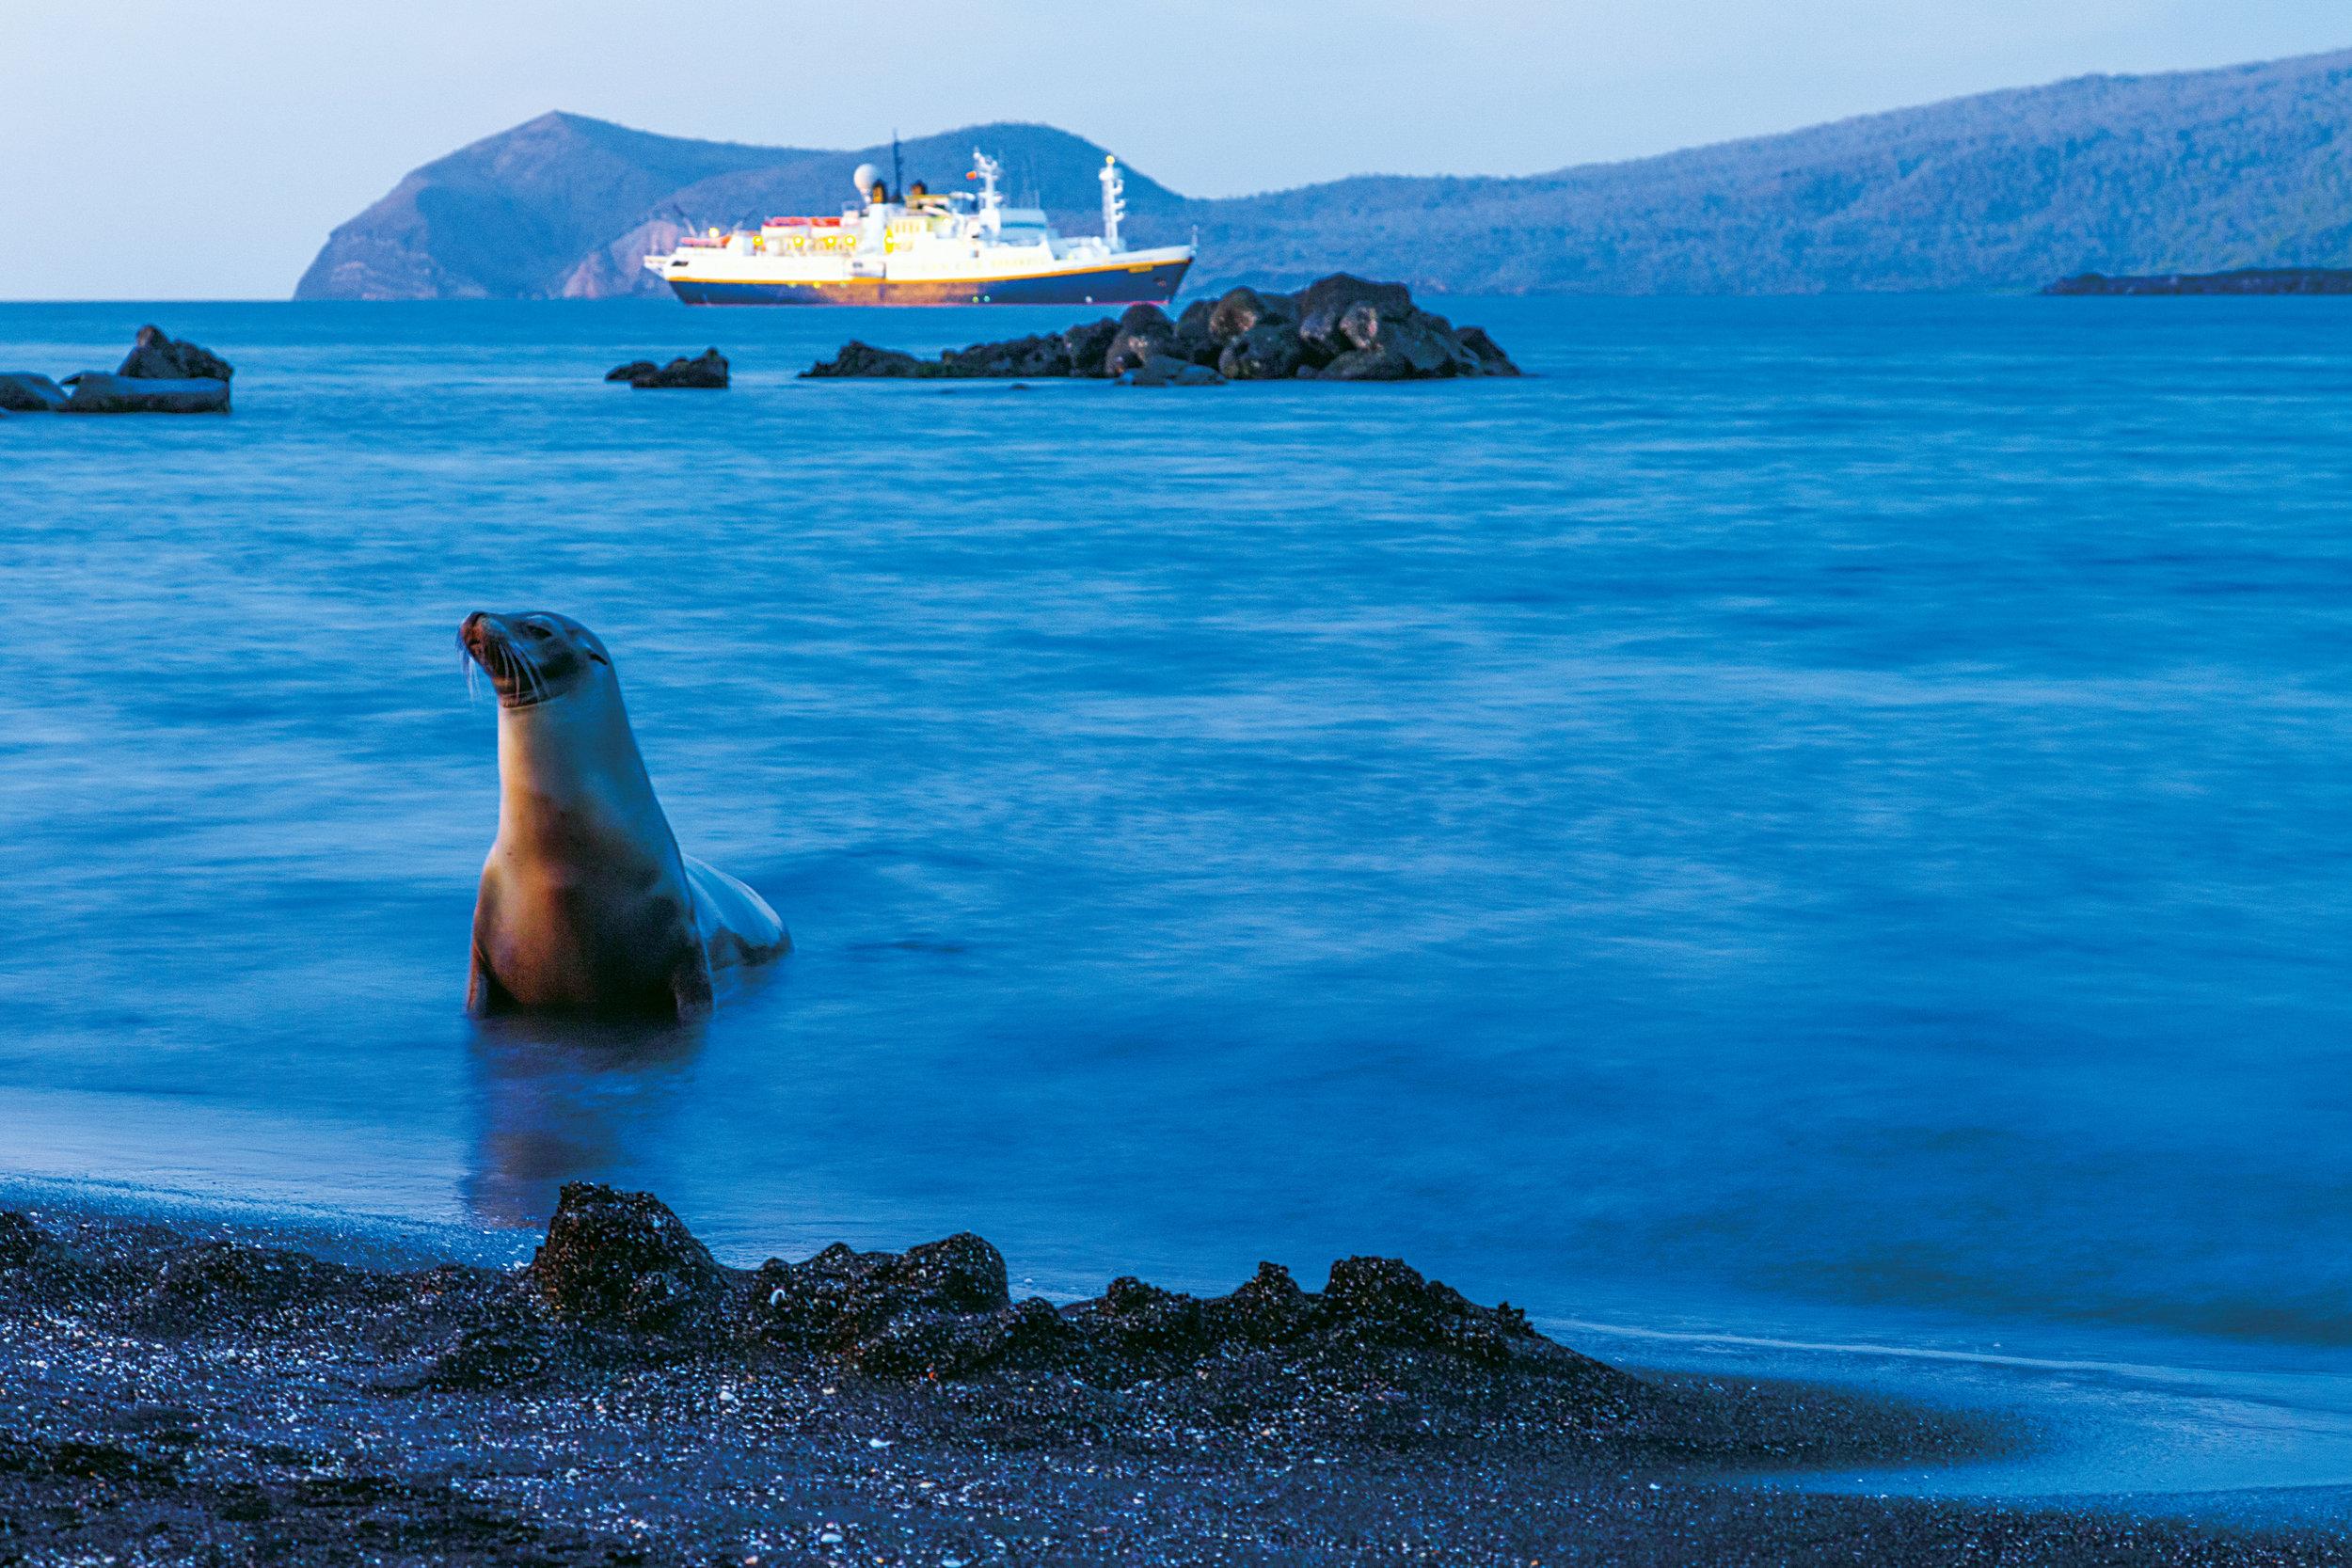 Galapagos Sea Lion (Zalophus wollebaeki), National Geographic Endeavour, Puerto Egas, Santiago Island, Galapagos Islands National Park, Ecuador